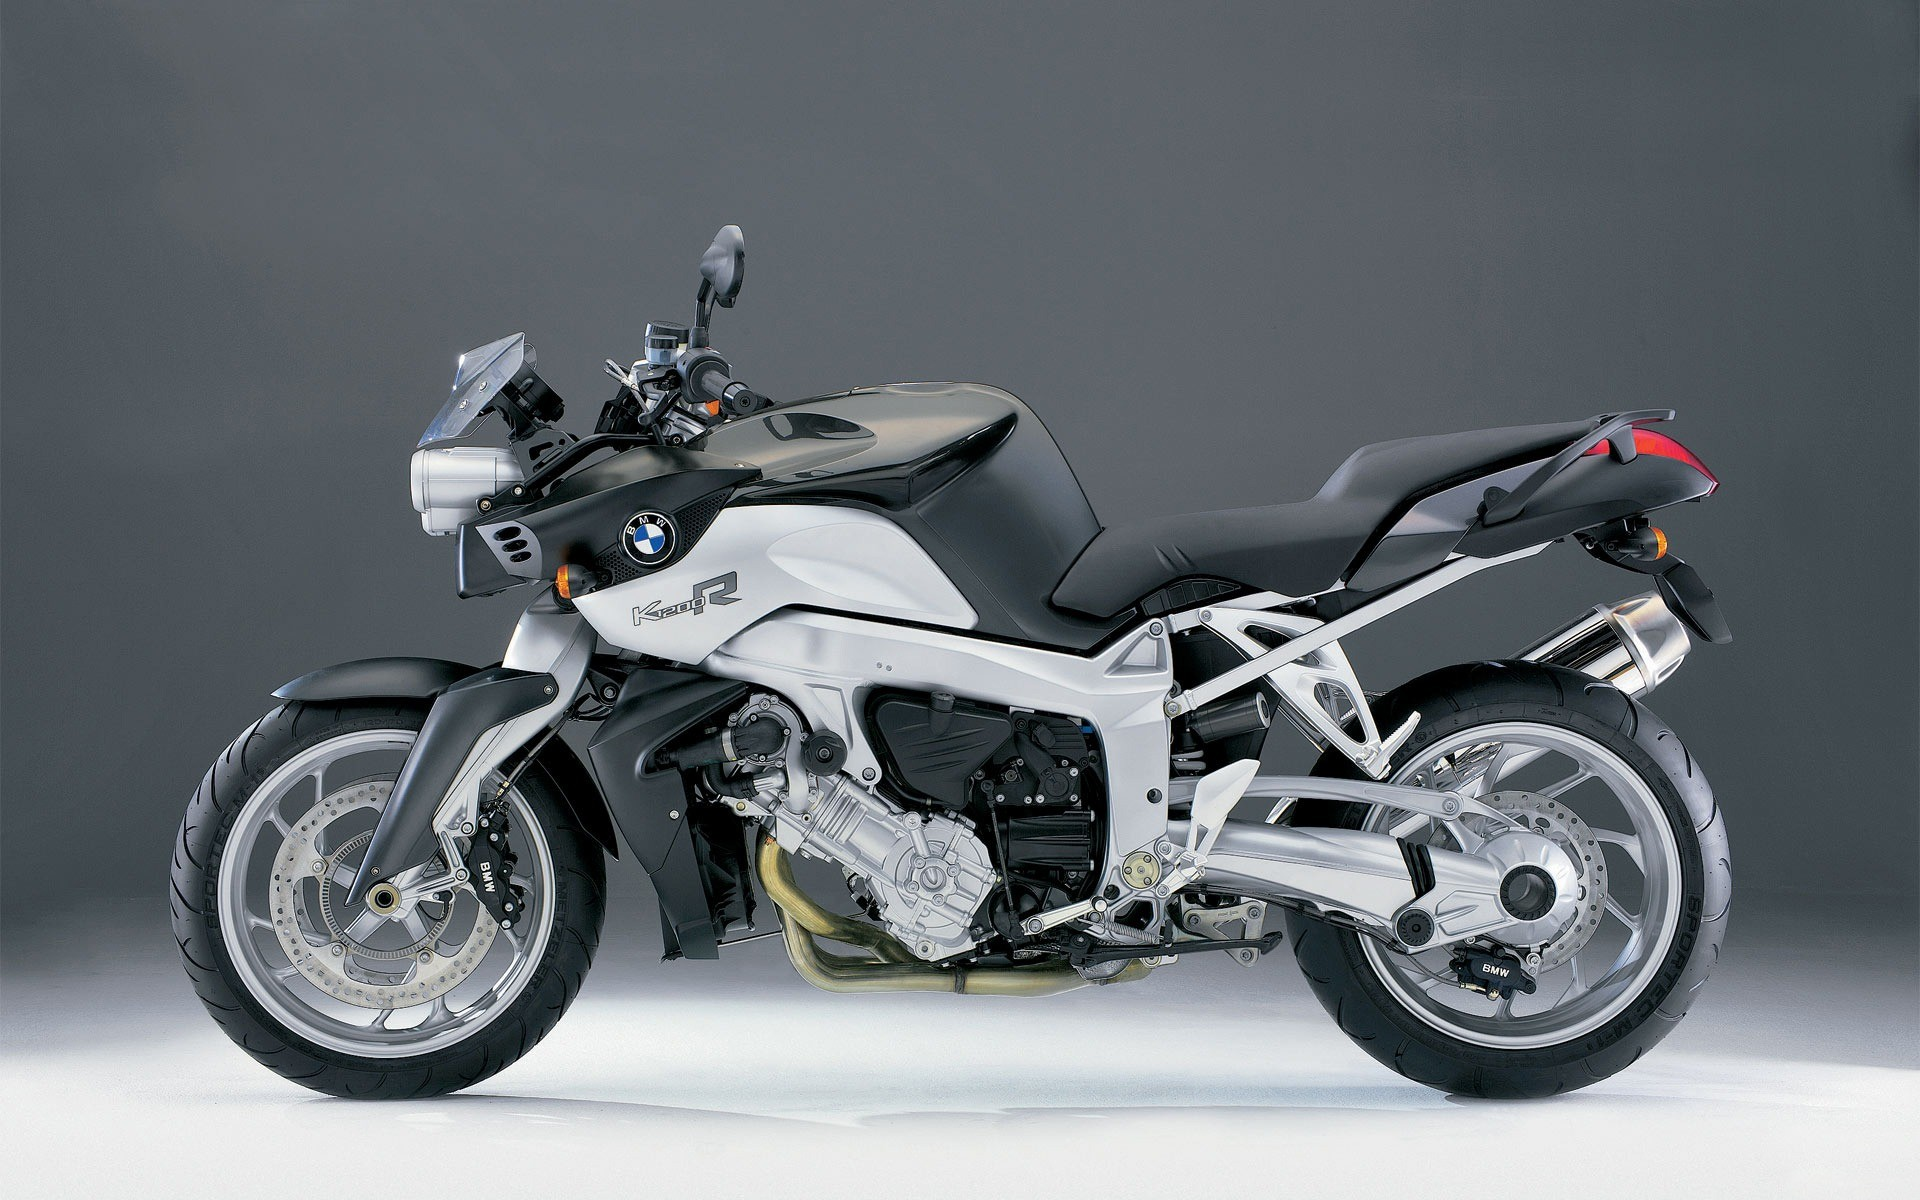 BMW K1200R Wallpaper BMW Motorcycles